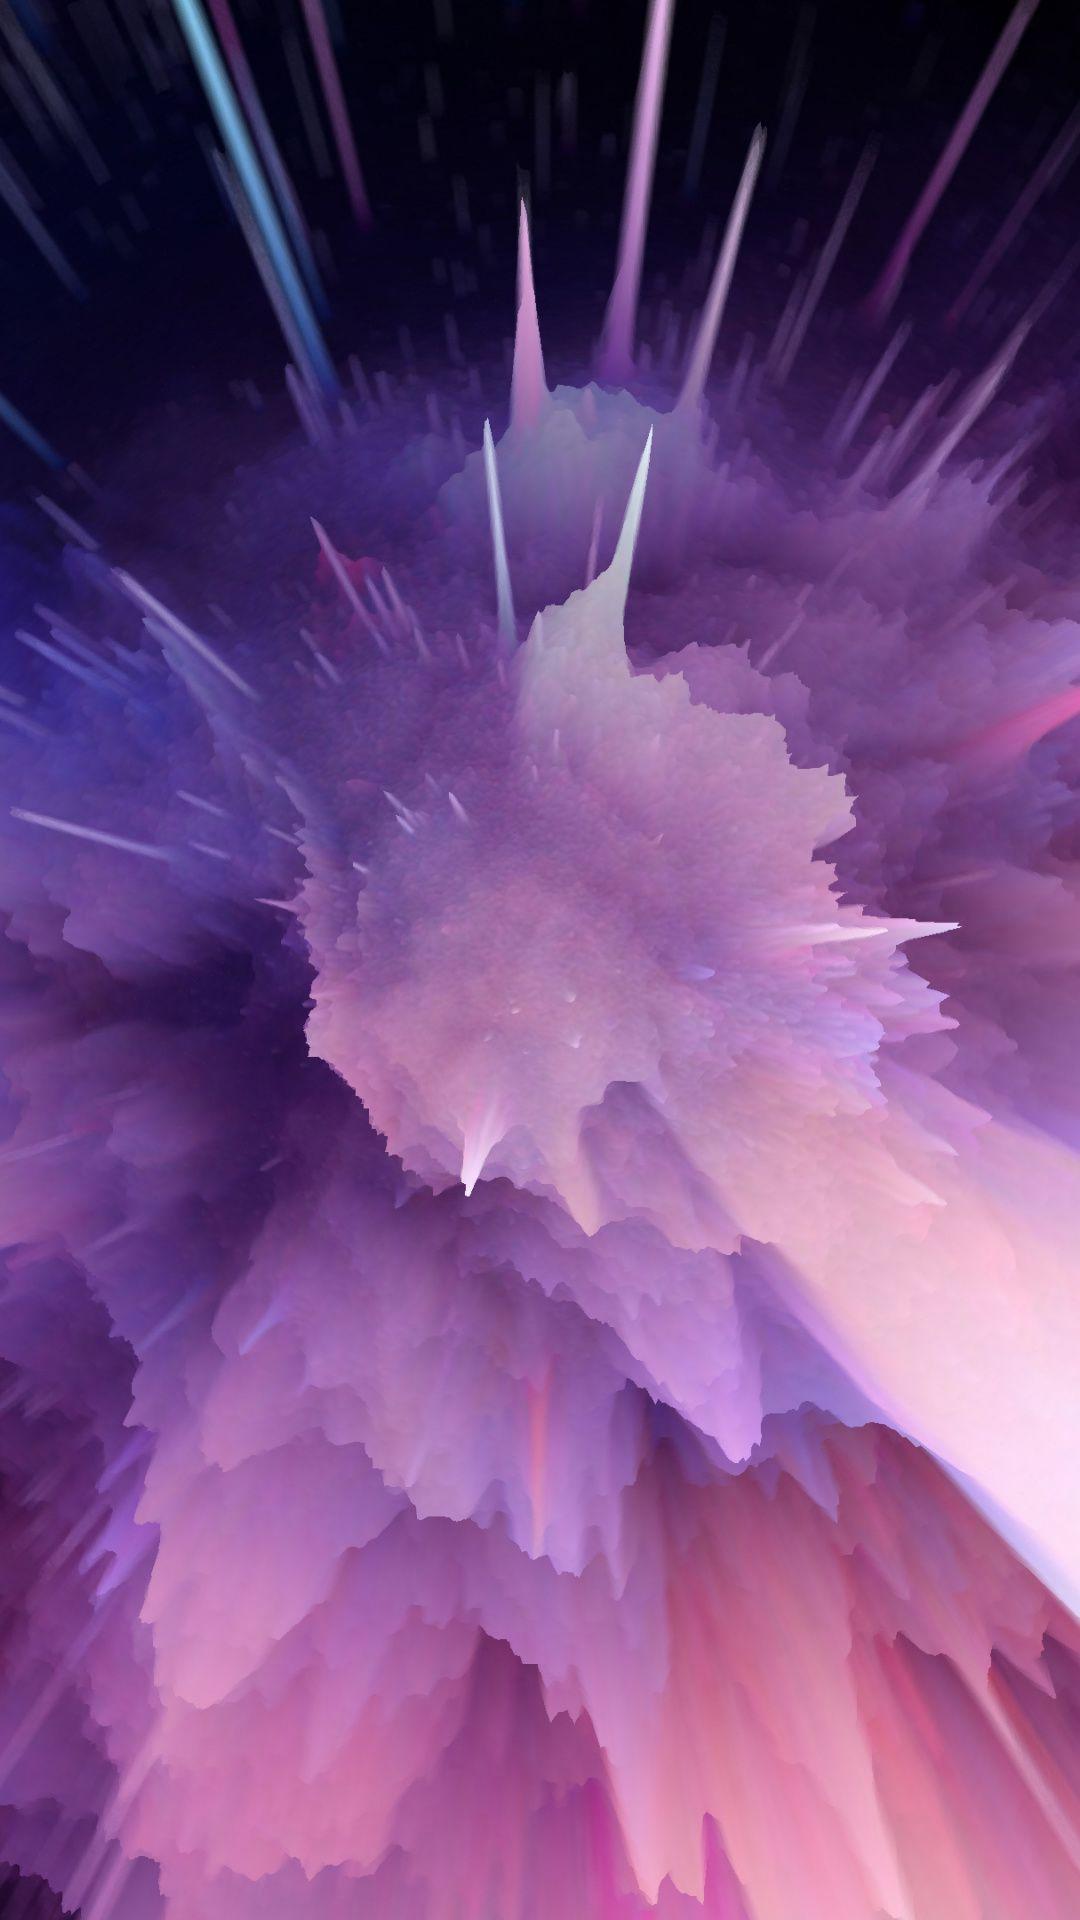 Clouds Blast Explosion Waves Violet 1080x1920 Wallpaper Mkbhd Wallpapers Clouds Beautiful Wallpapers